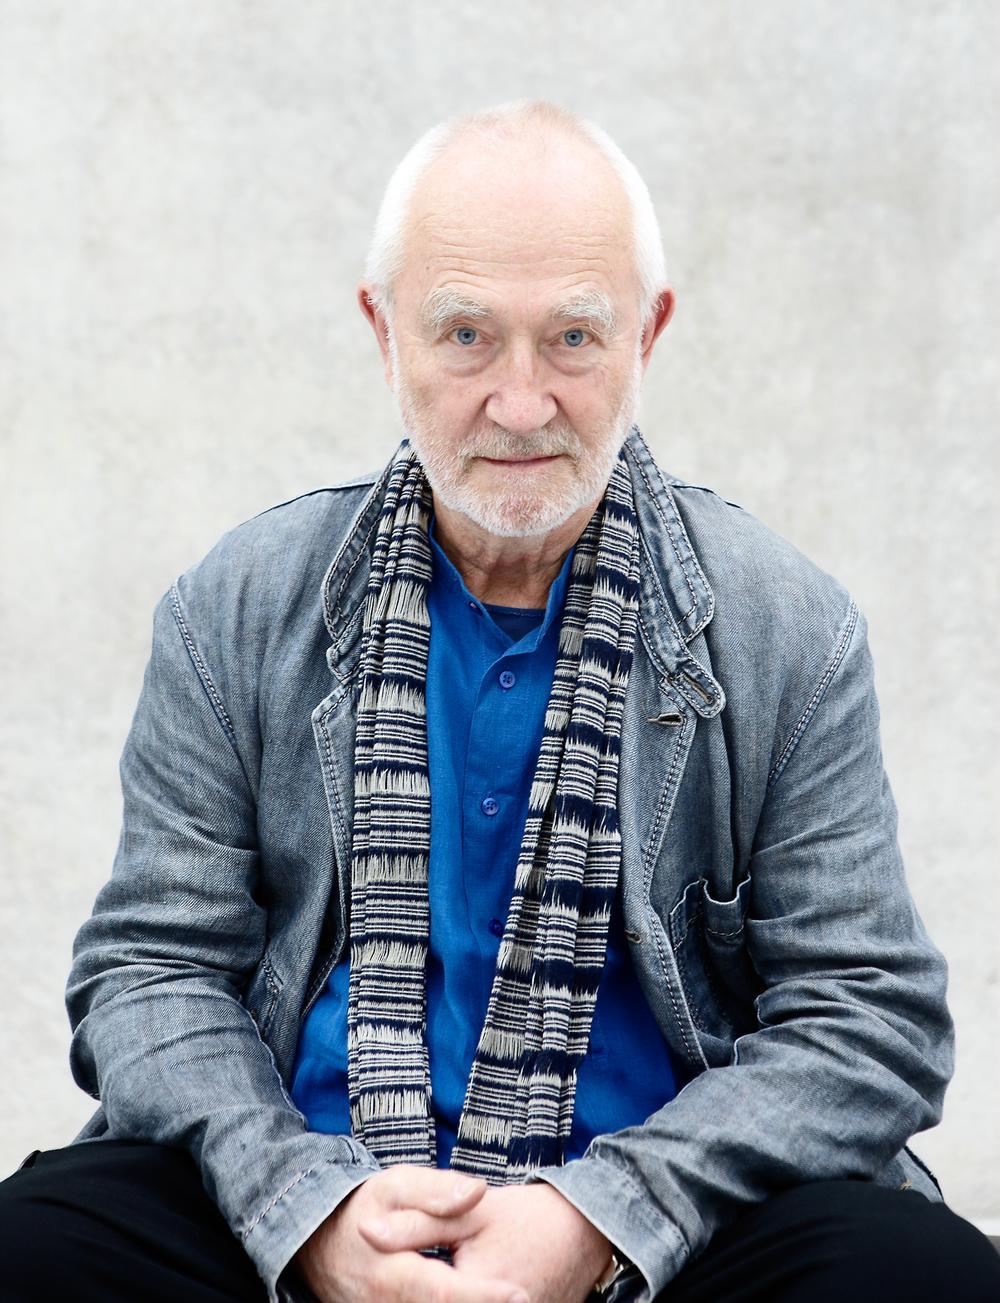 Peter Zumthor / MARTIN MISCHKULNIG, COURTESY OF PETER ZUMTHOR & PA